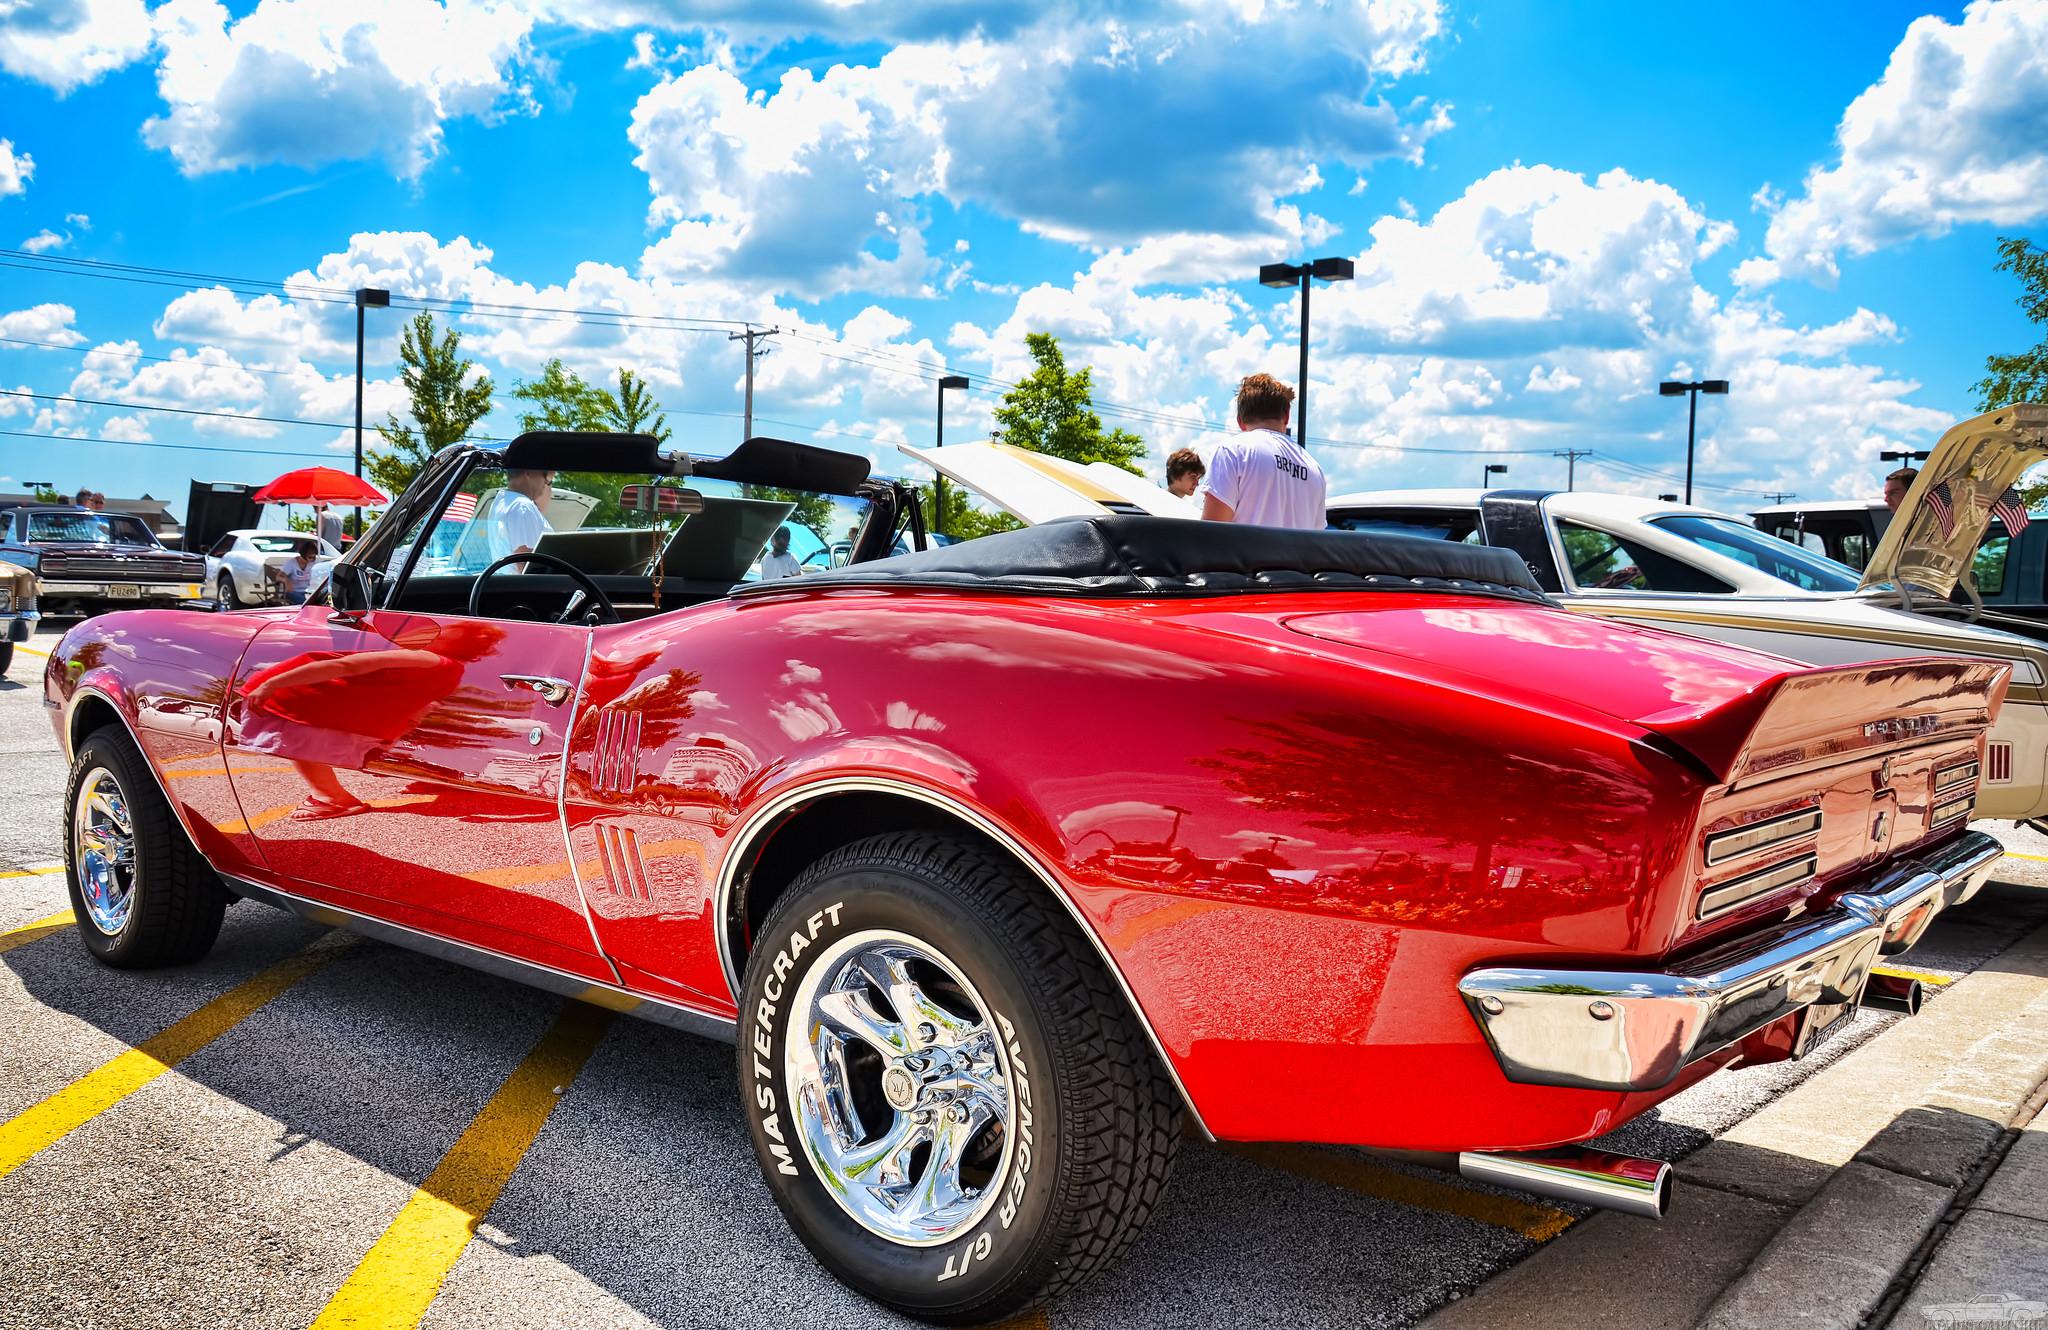 Essay 6: The Dream of a Convertible Car [#52essays2017]